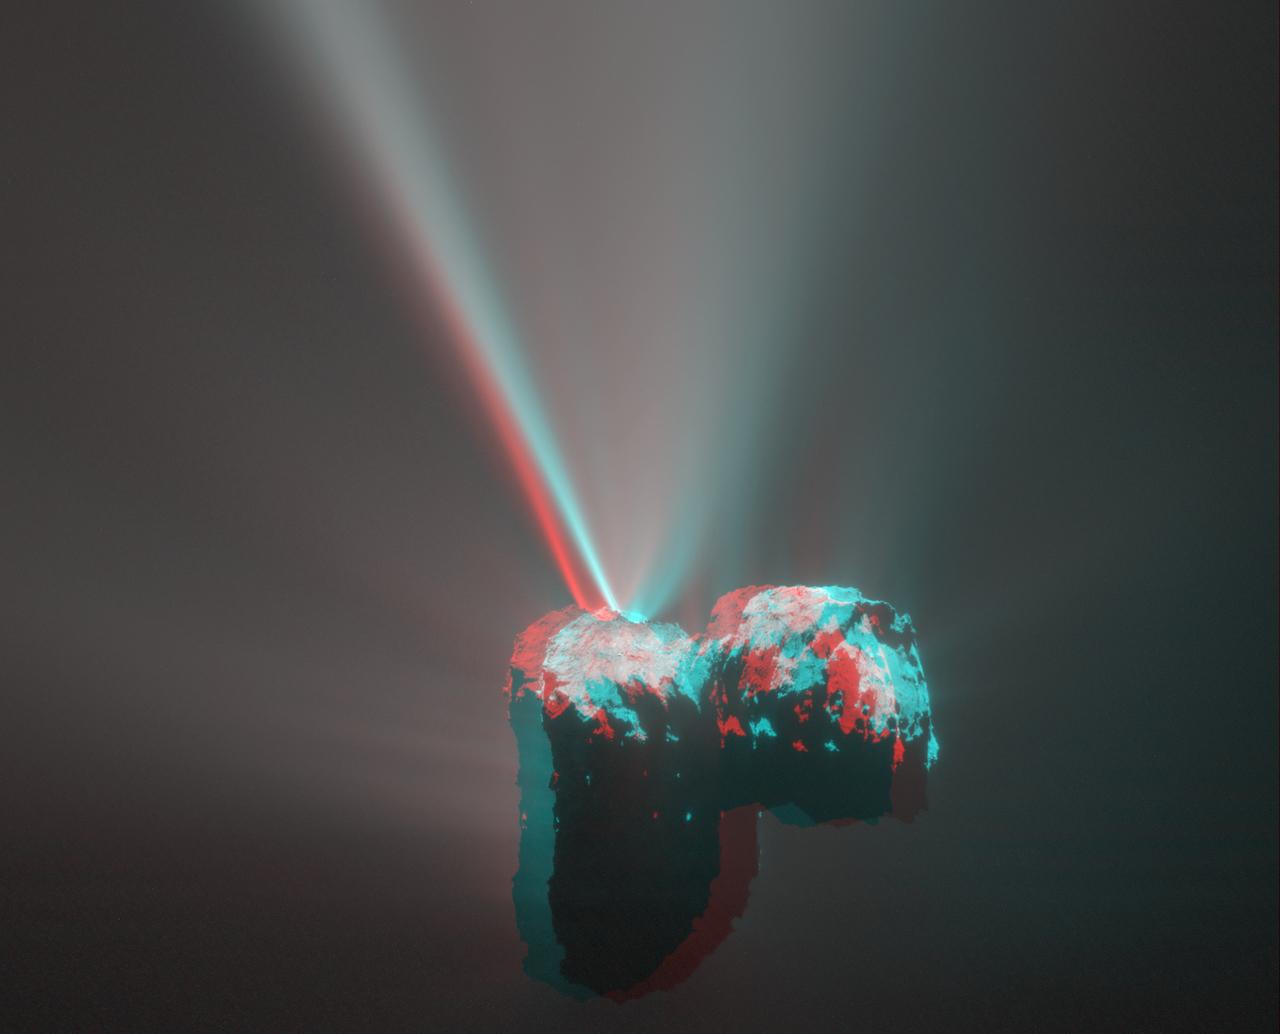 1567215890202-Rosetta_OSIRIS_Comet_67P_jet_in_3D_1280.jpg